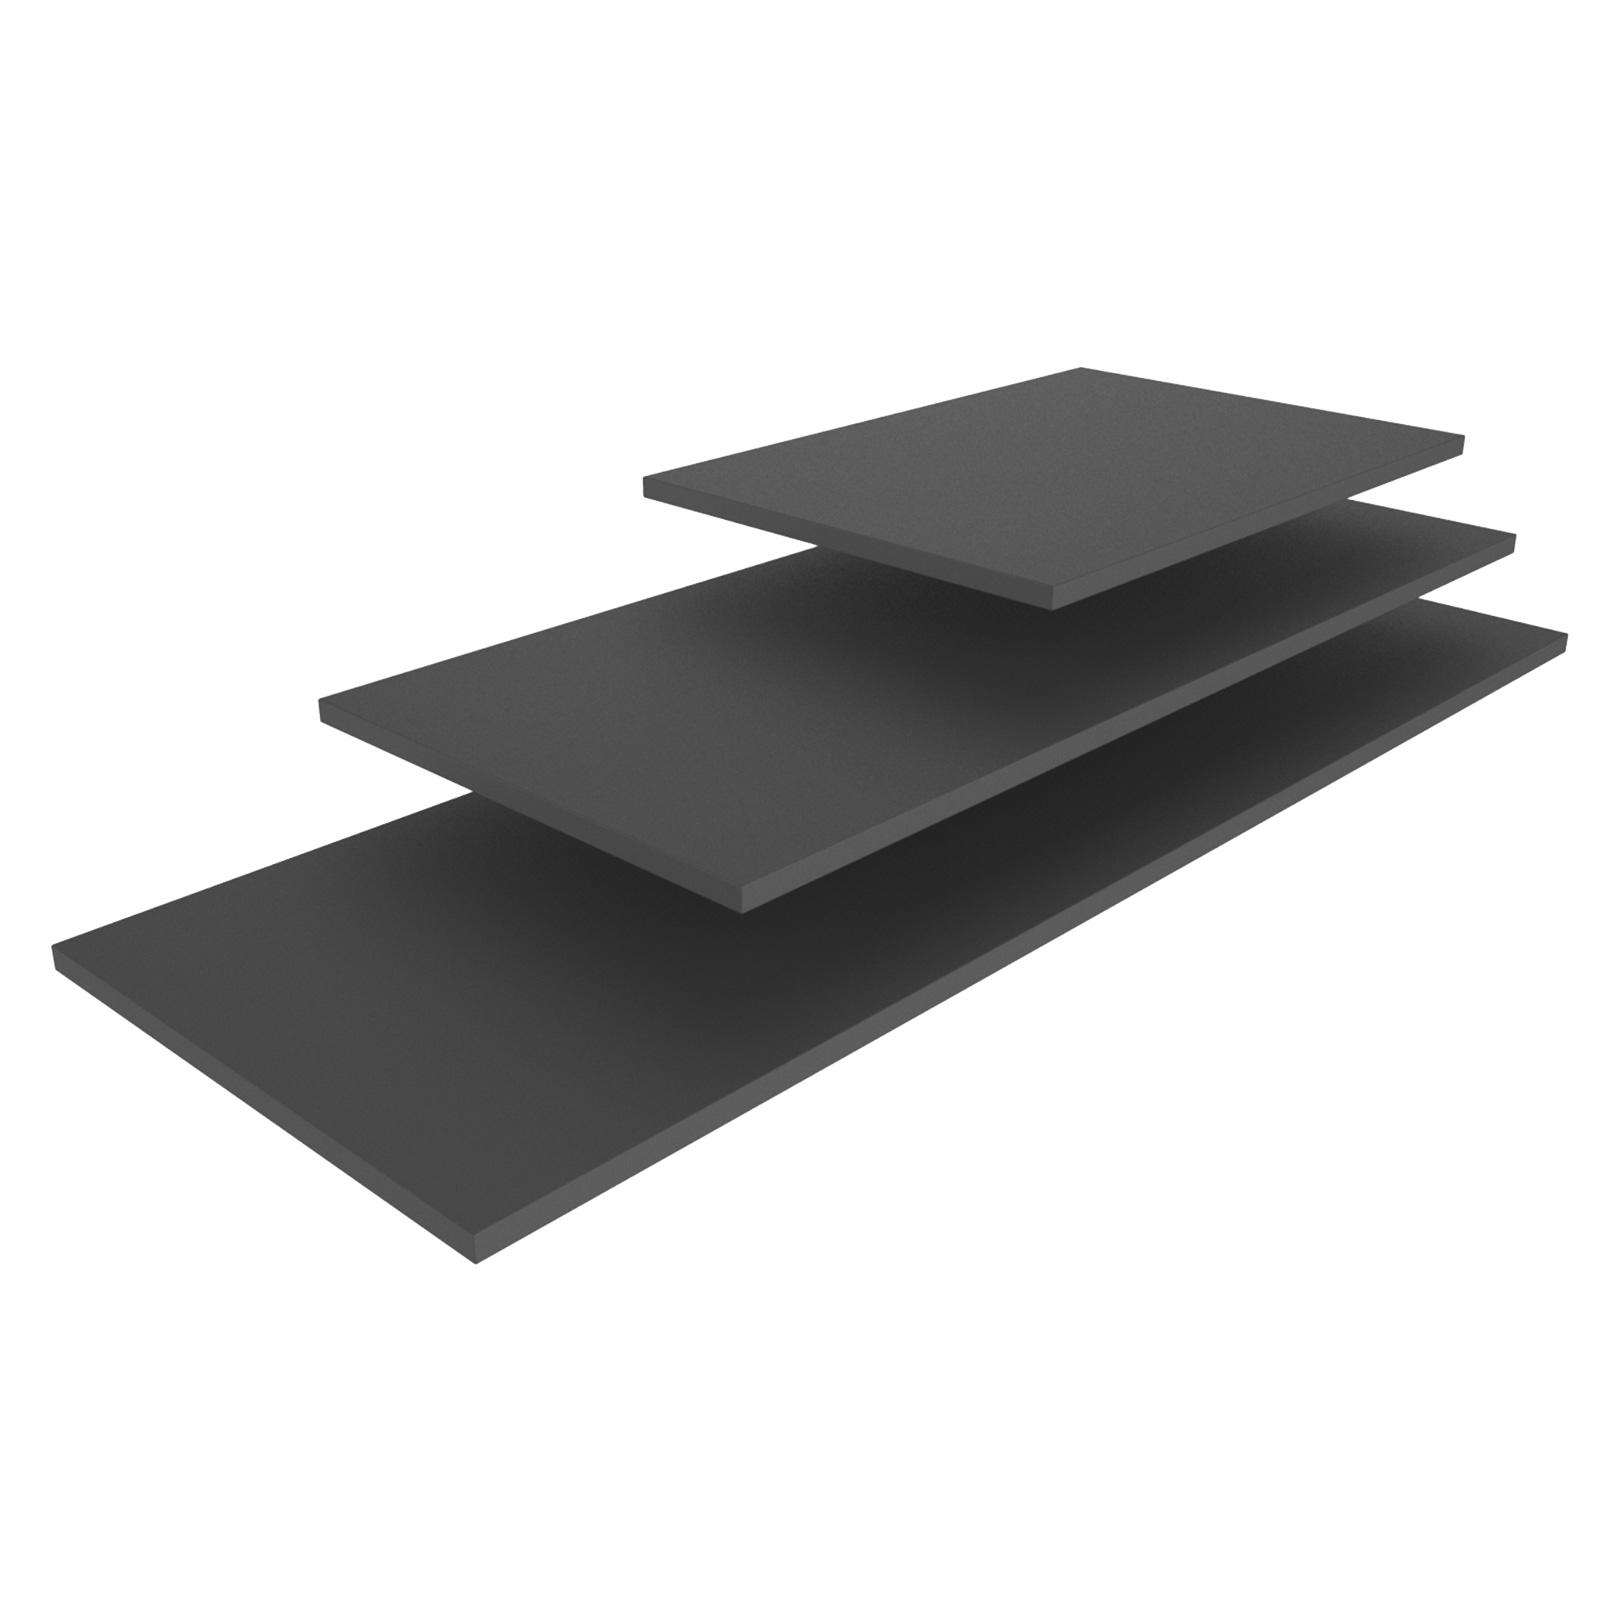 Vollrath V904682 display riser shelf